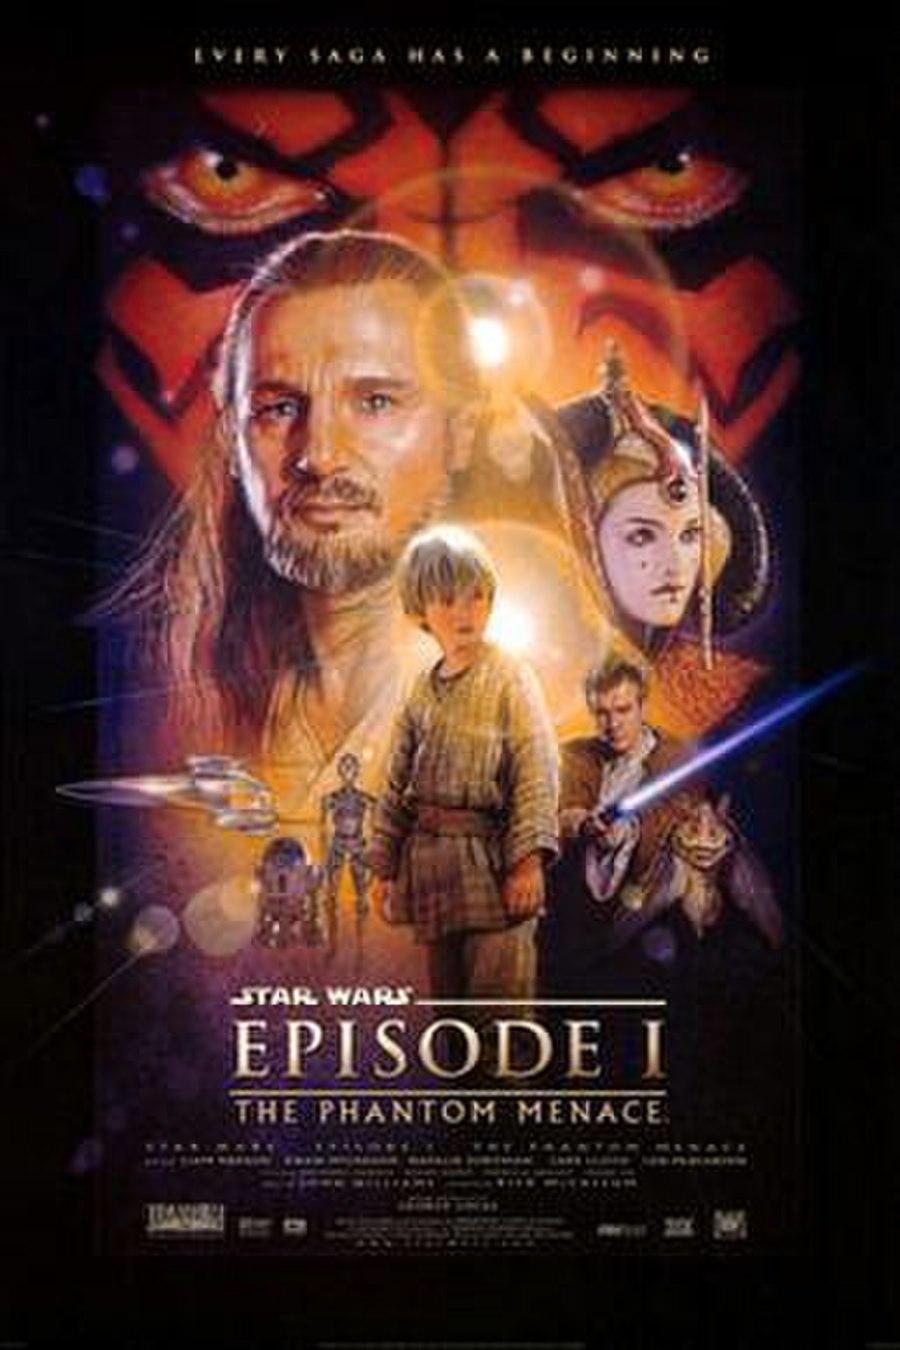 Star Wars: Episode I – The Phantom Menace